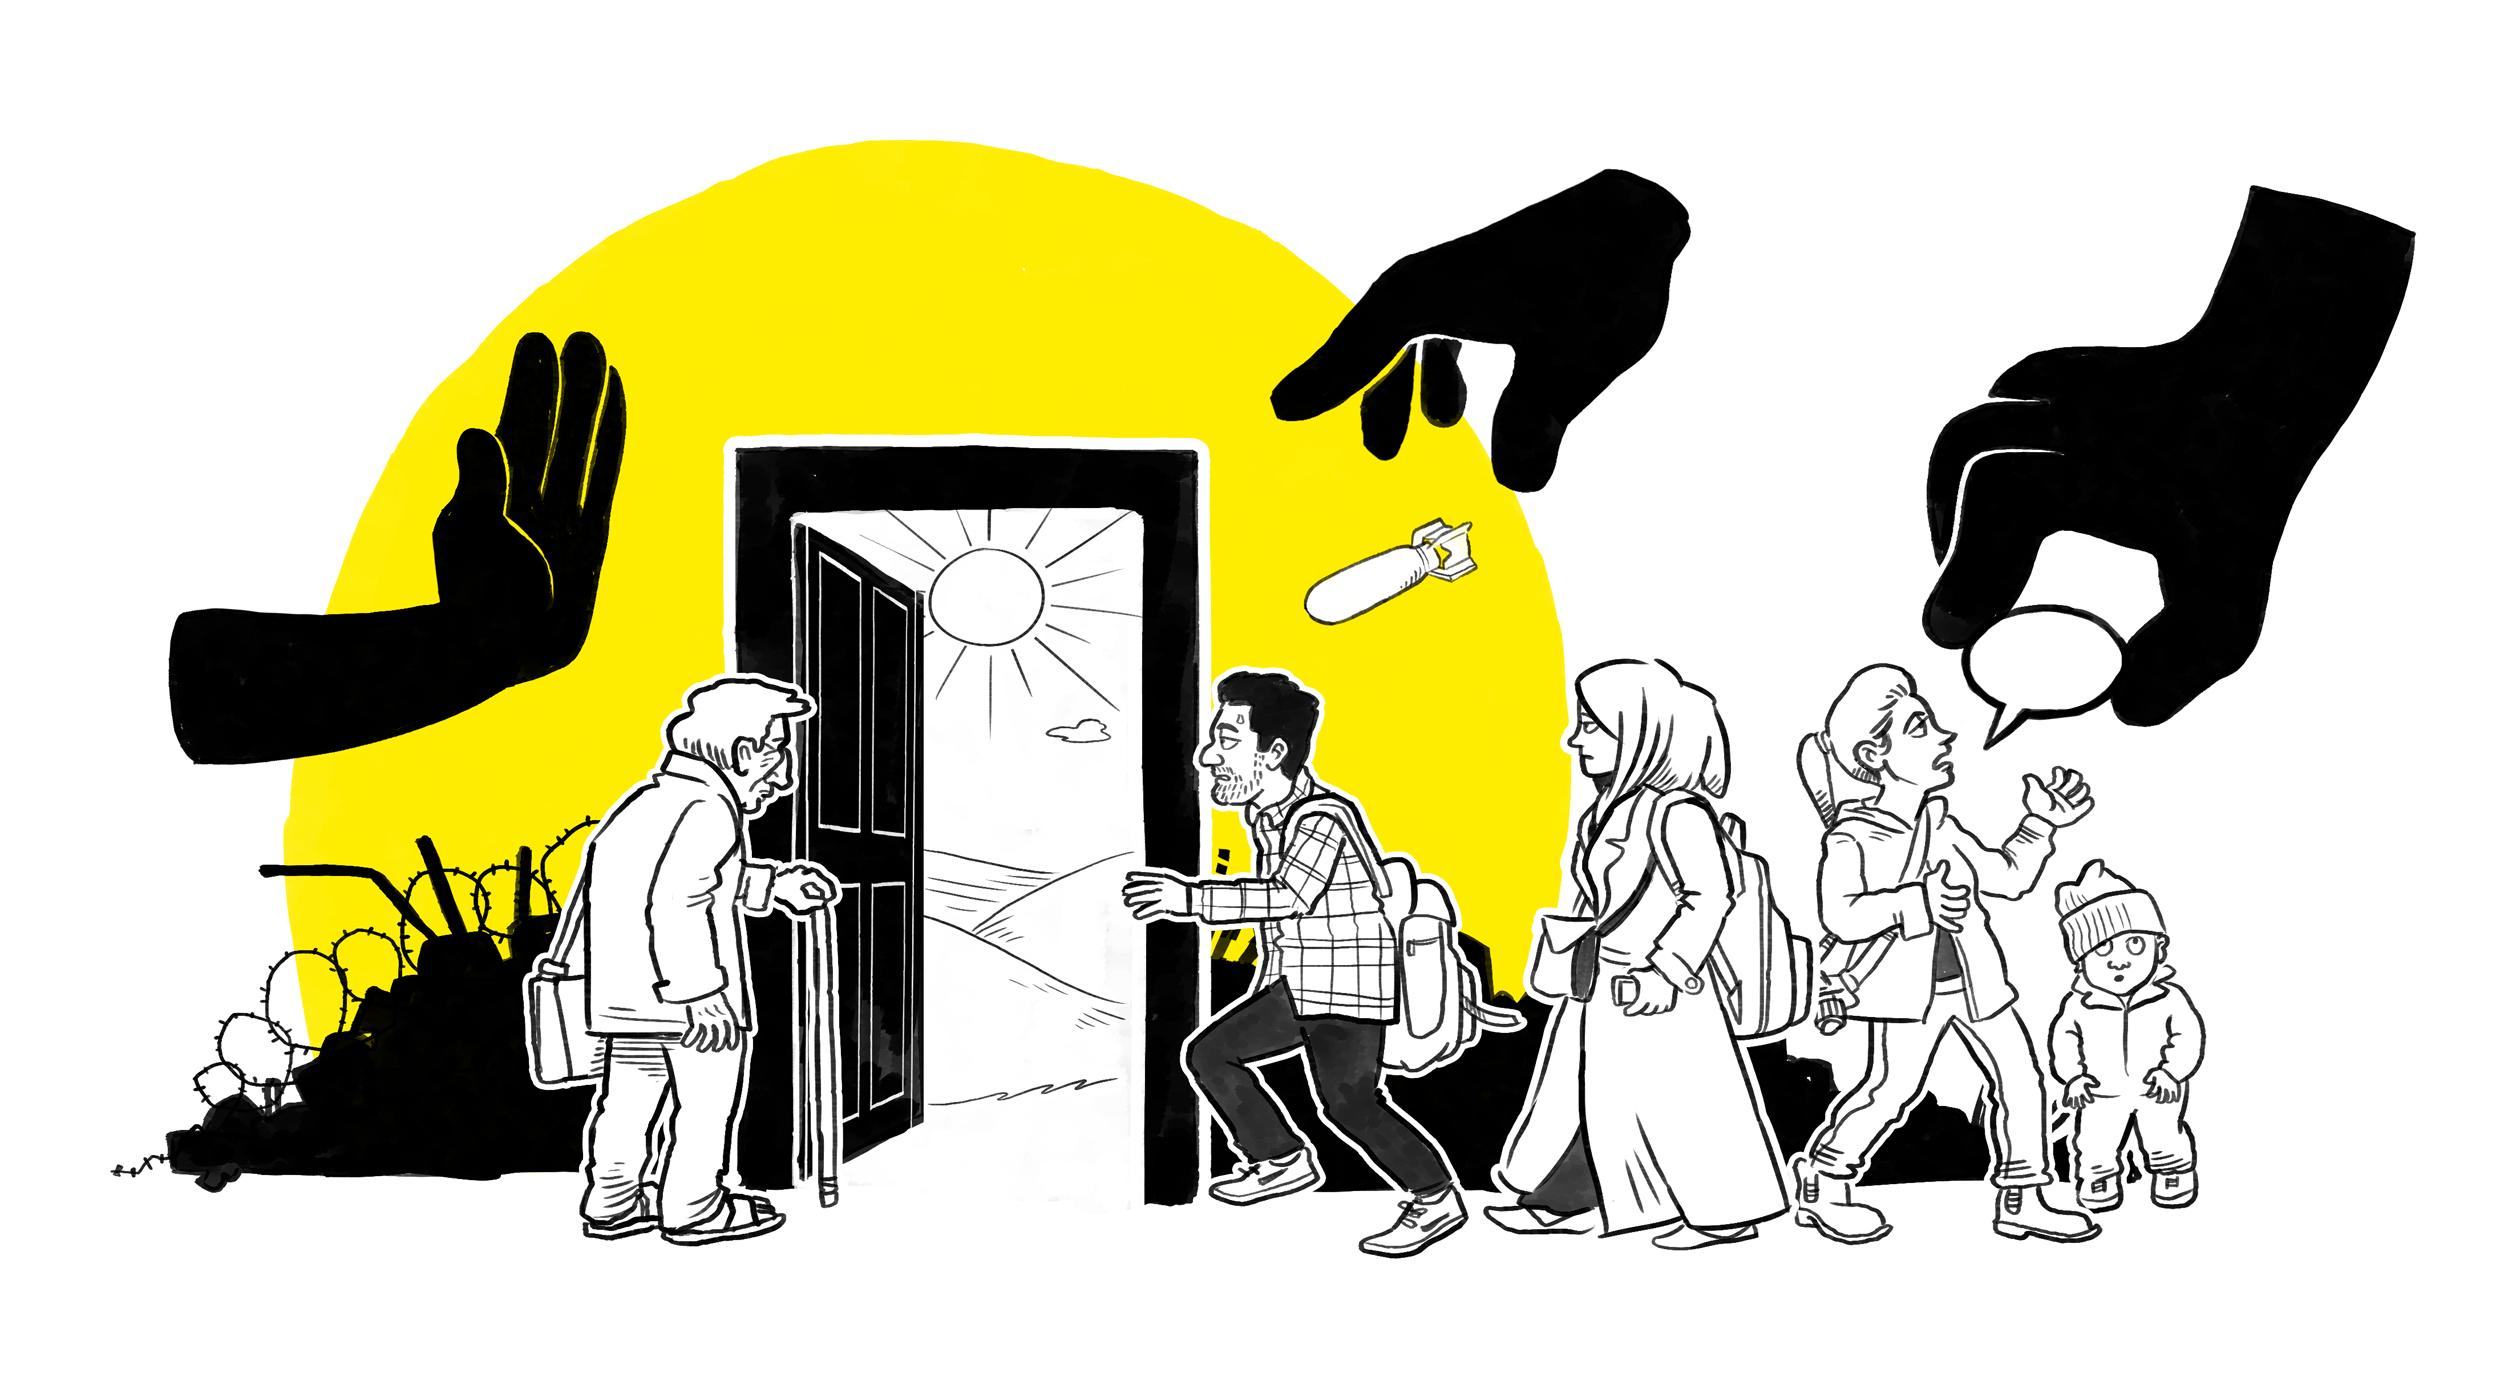 amnesty-international-promo-cognitive-05.jpg